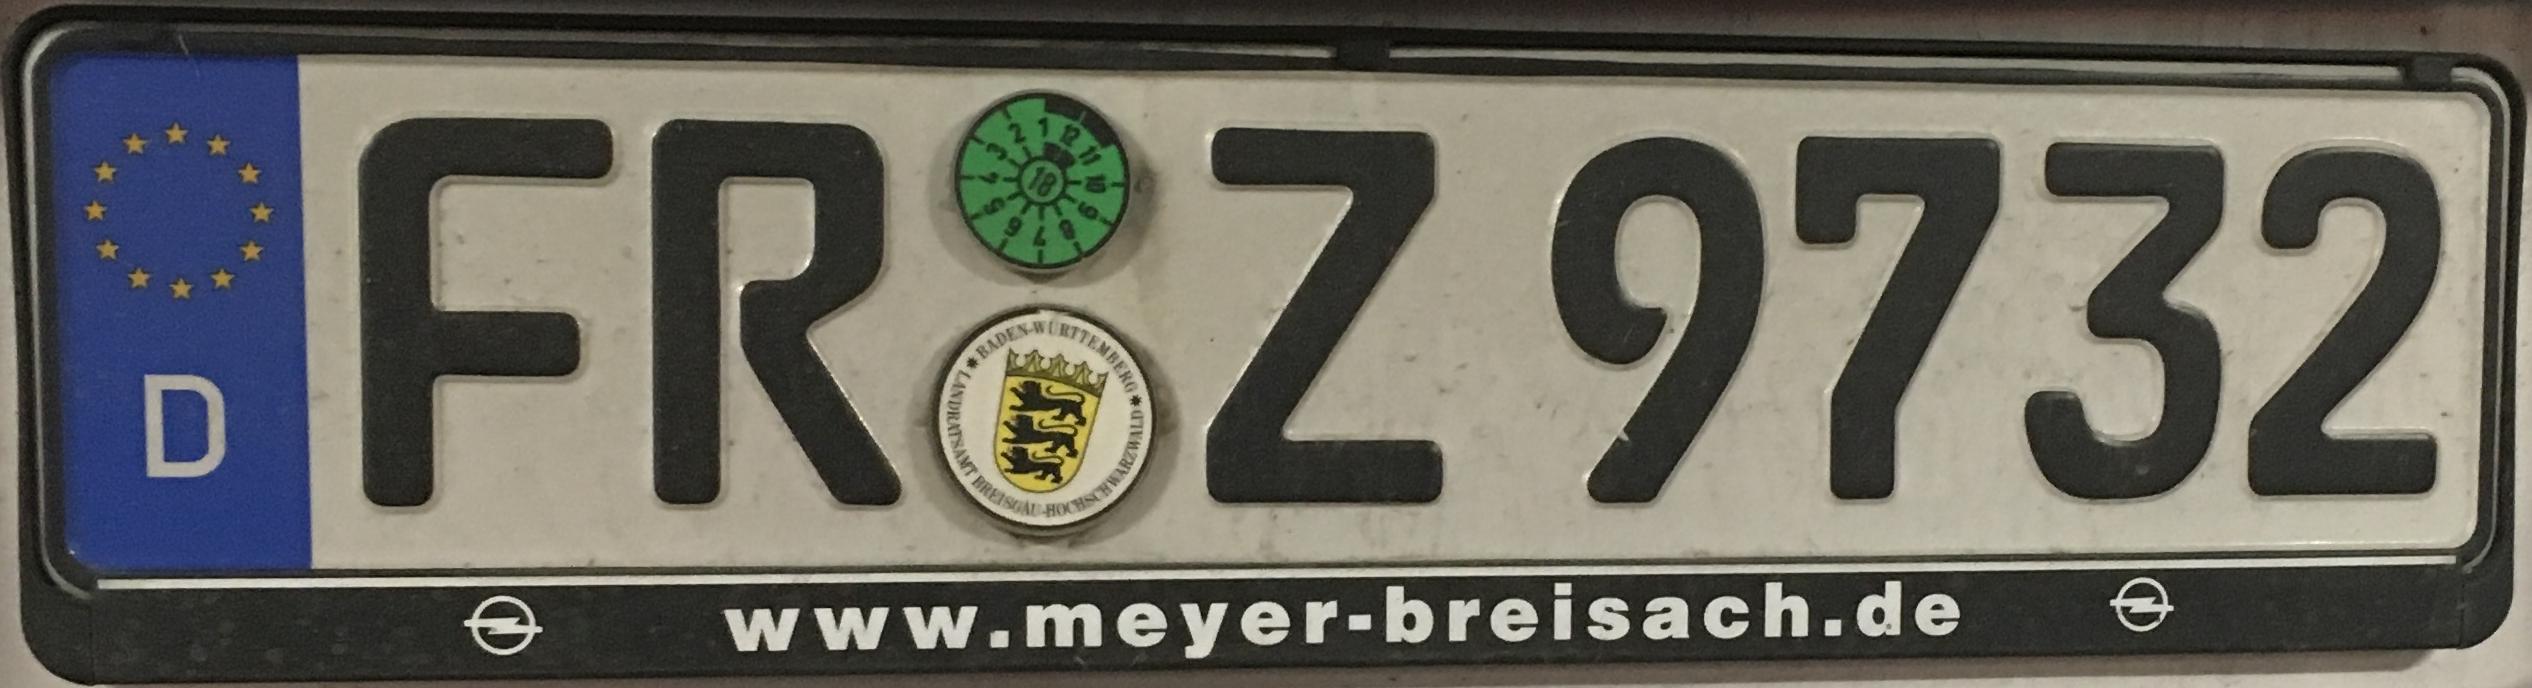 Registrační značky Německo – FR – Freiburg im Breisgau, foto: www.podalnici.cz